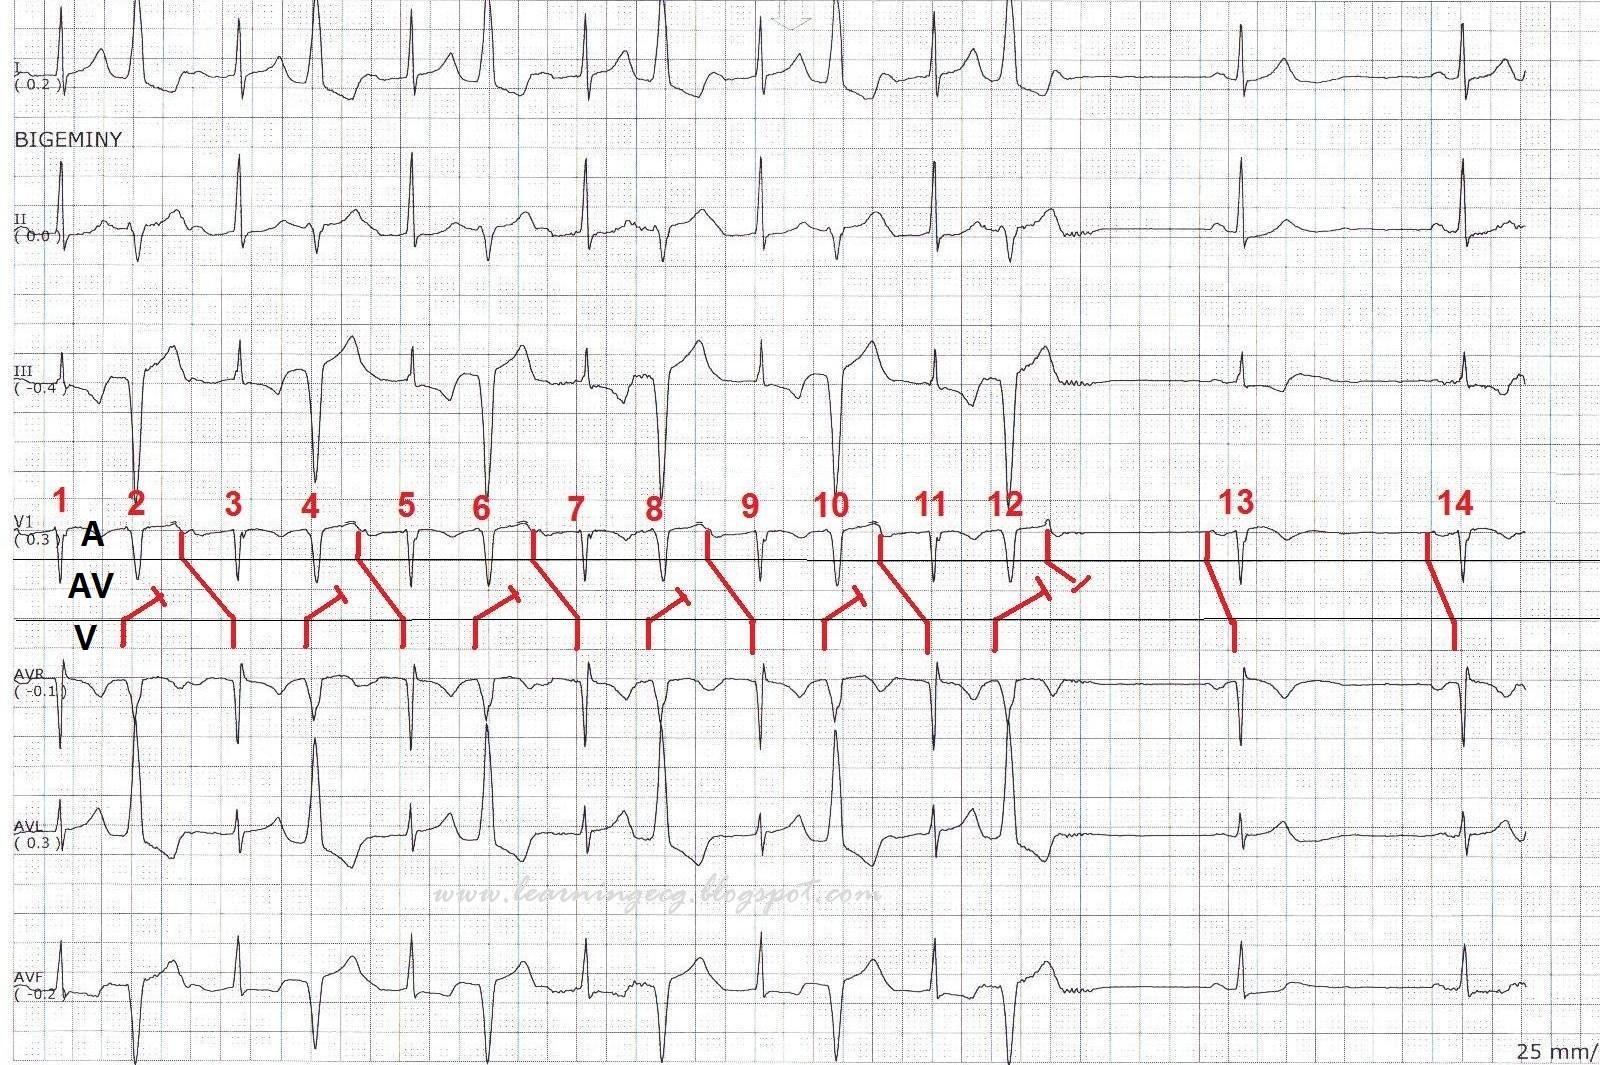 ecg rhythms  prolonged pr interval due to concealed